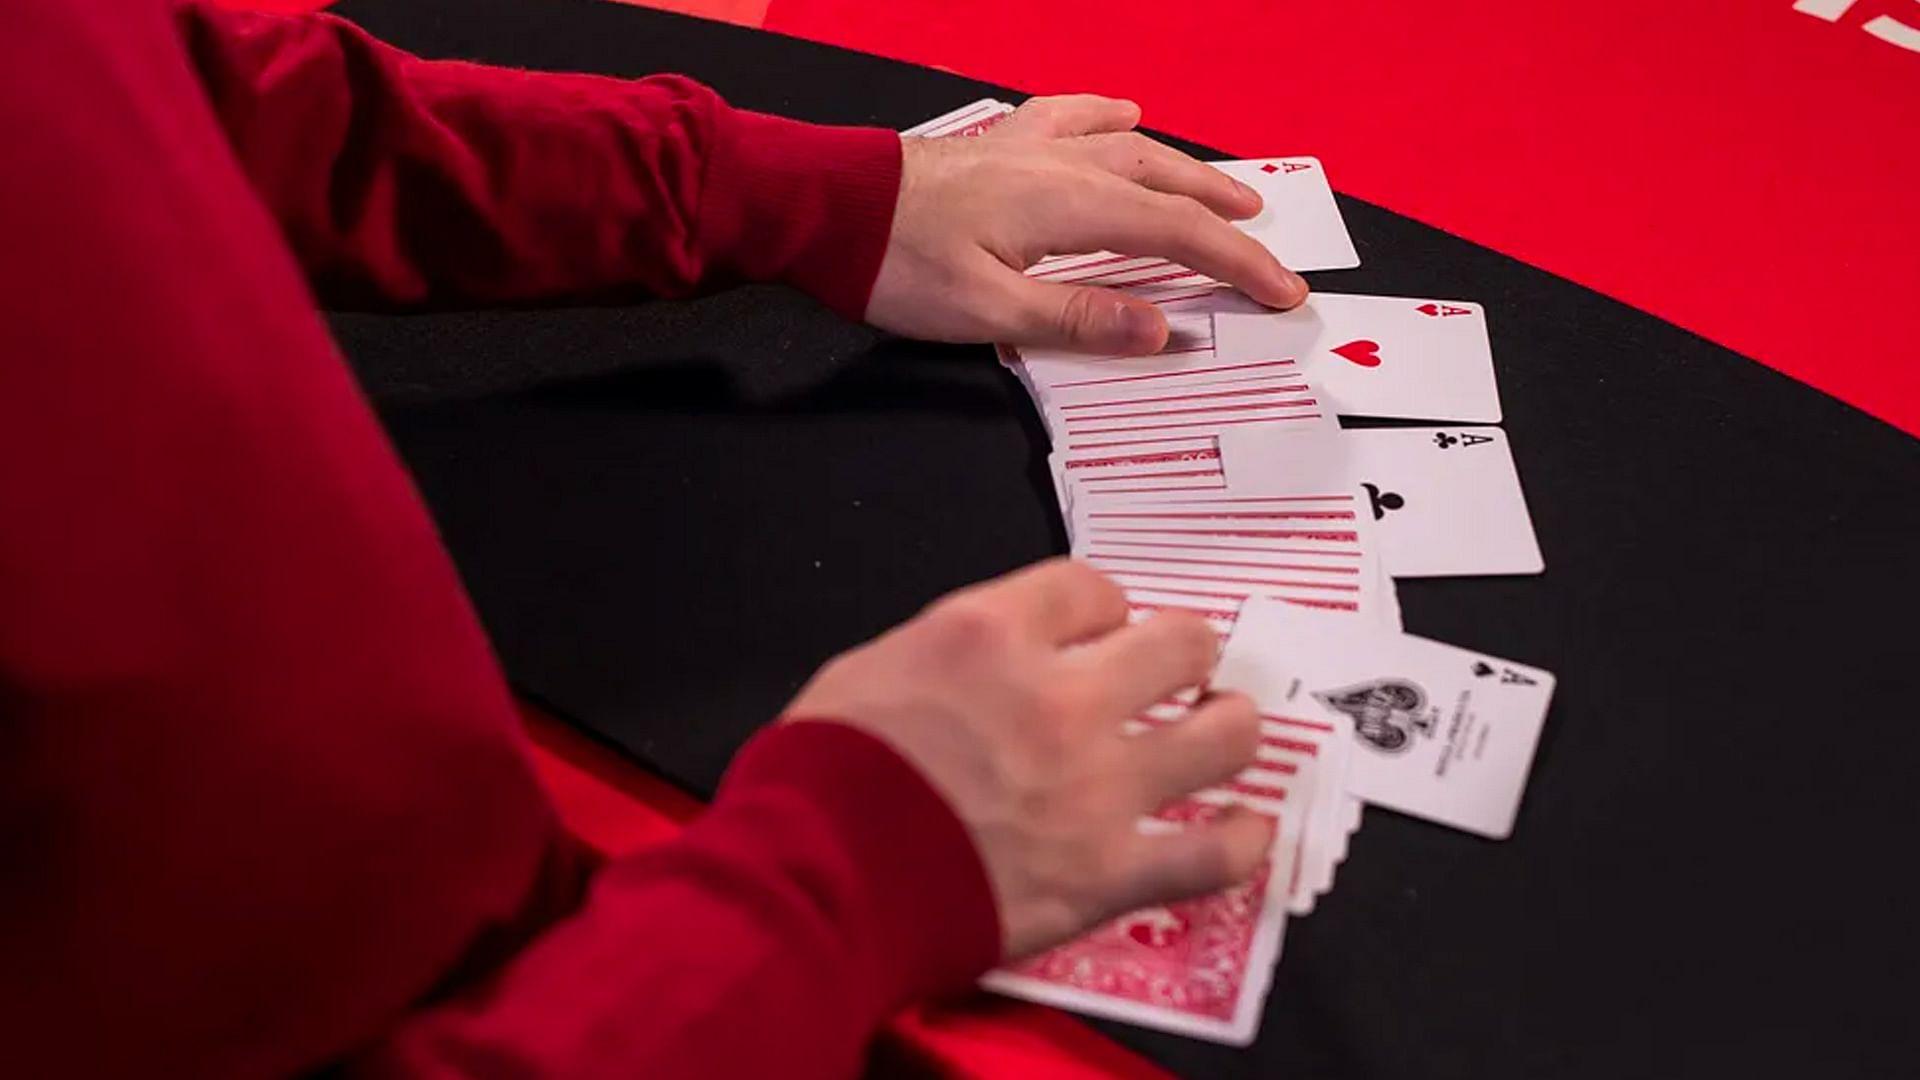 Where Can I Learn Easy Card Tricks?